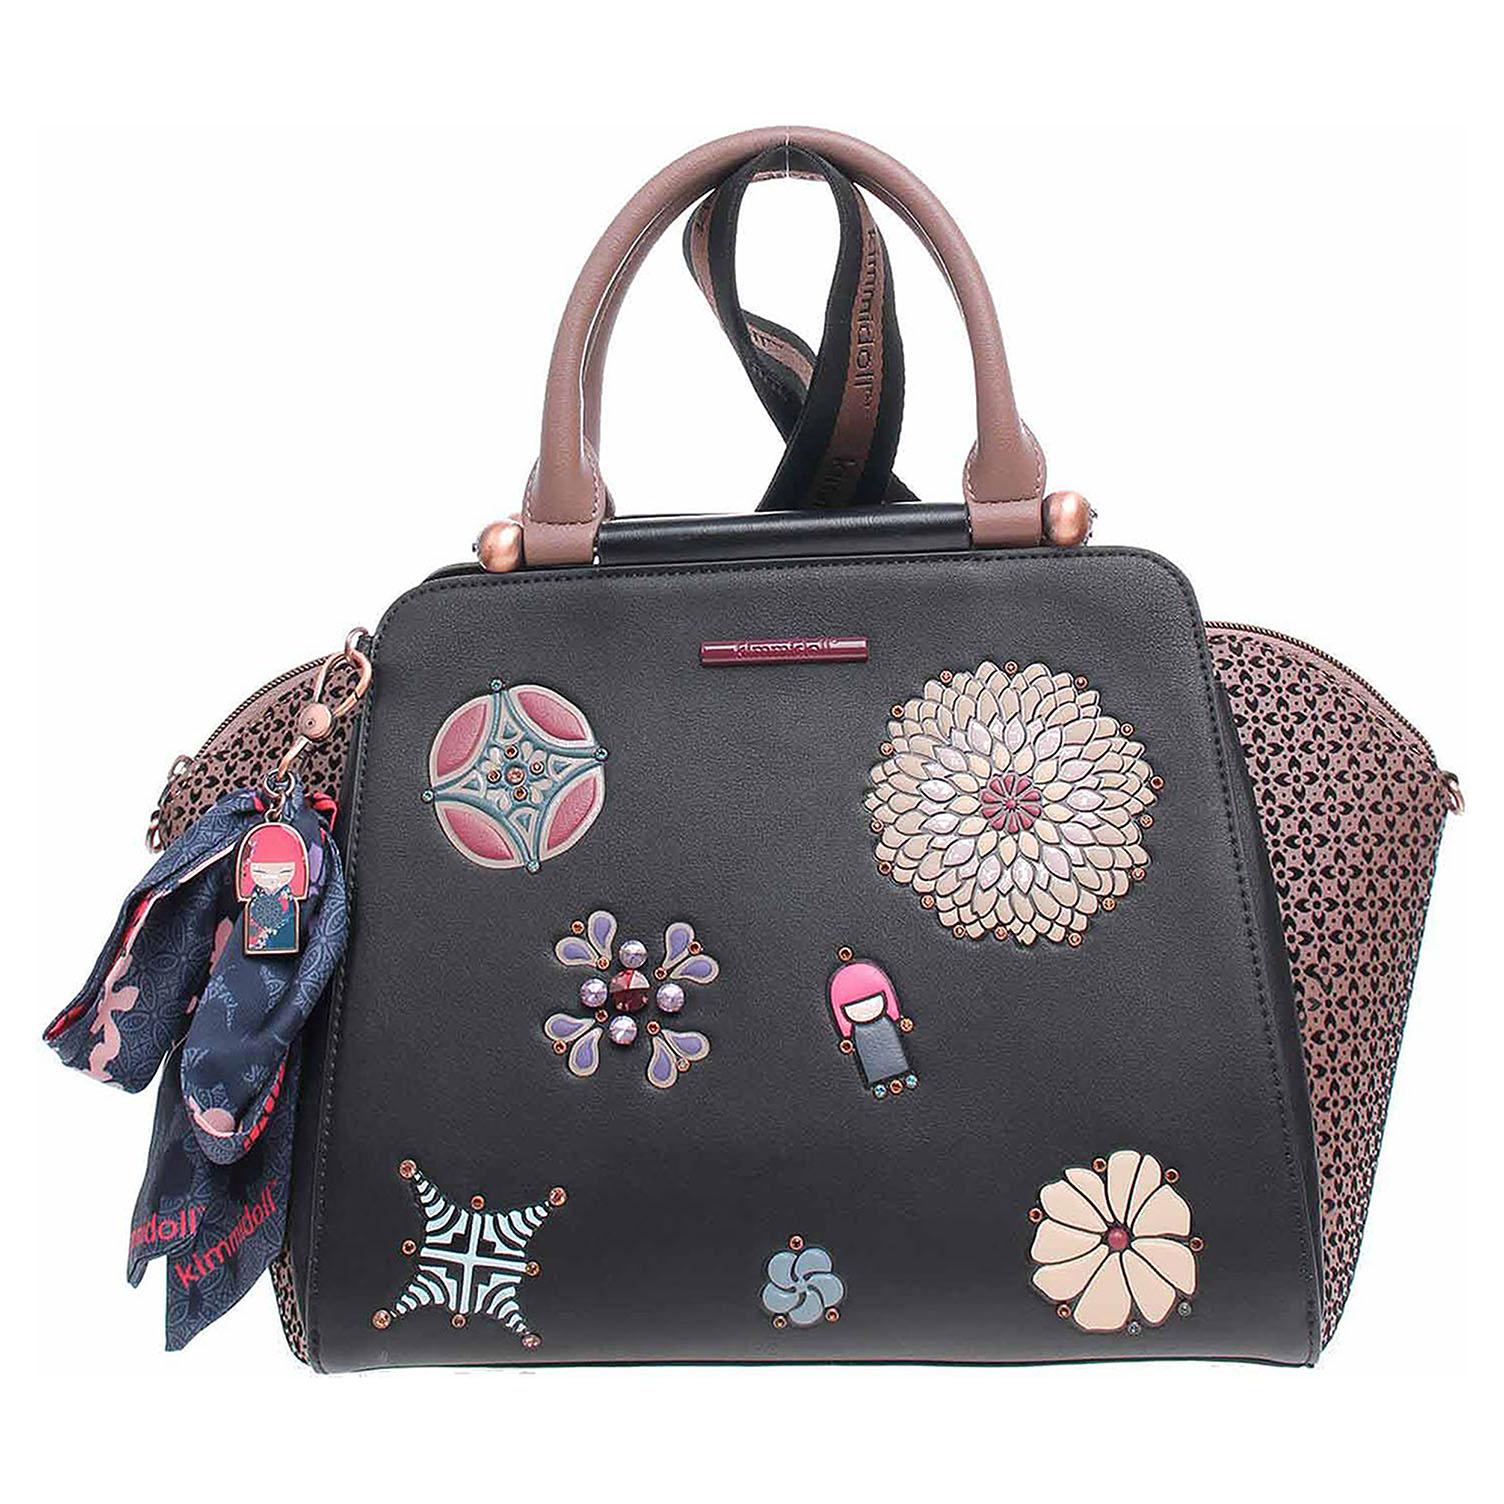 Kimmidoll dámská kabelka 29661-01 black 29661-01 black 1